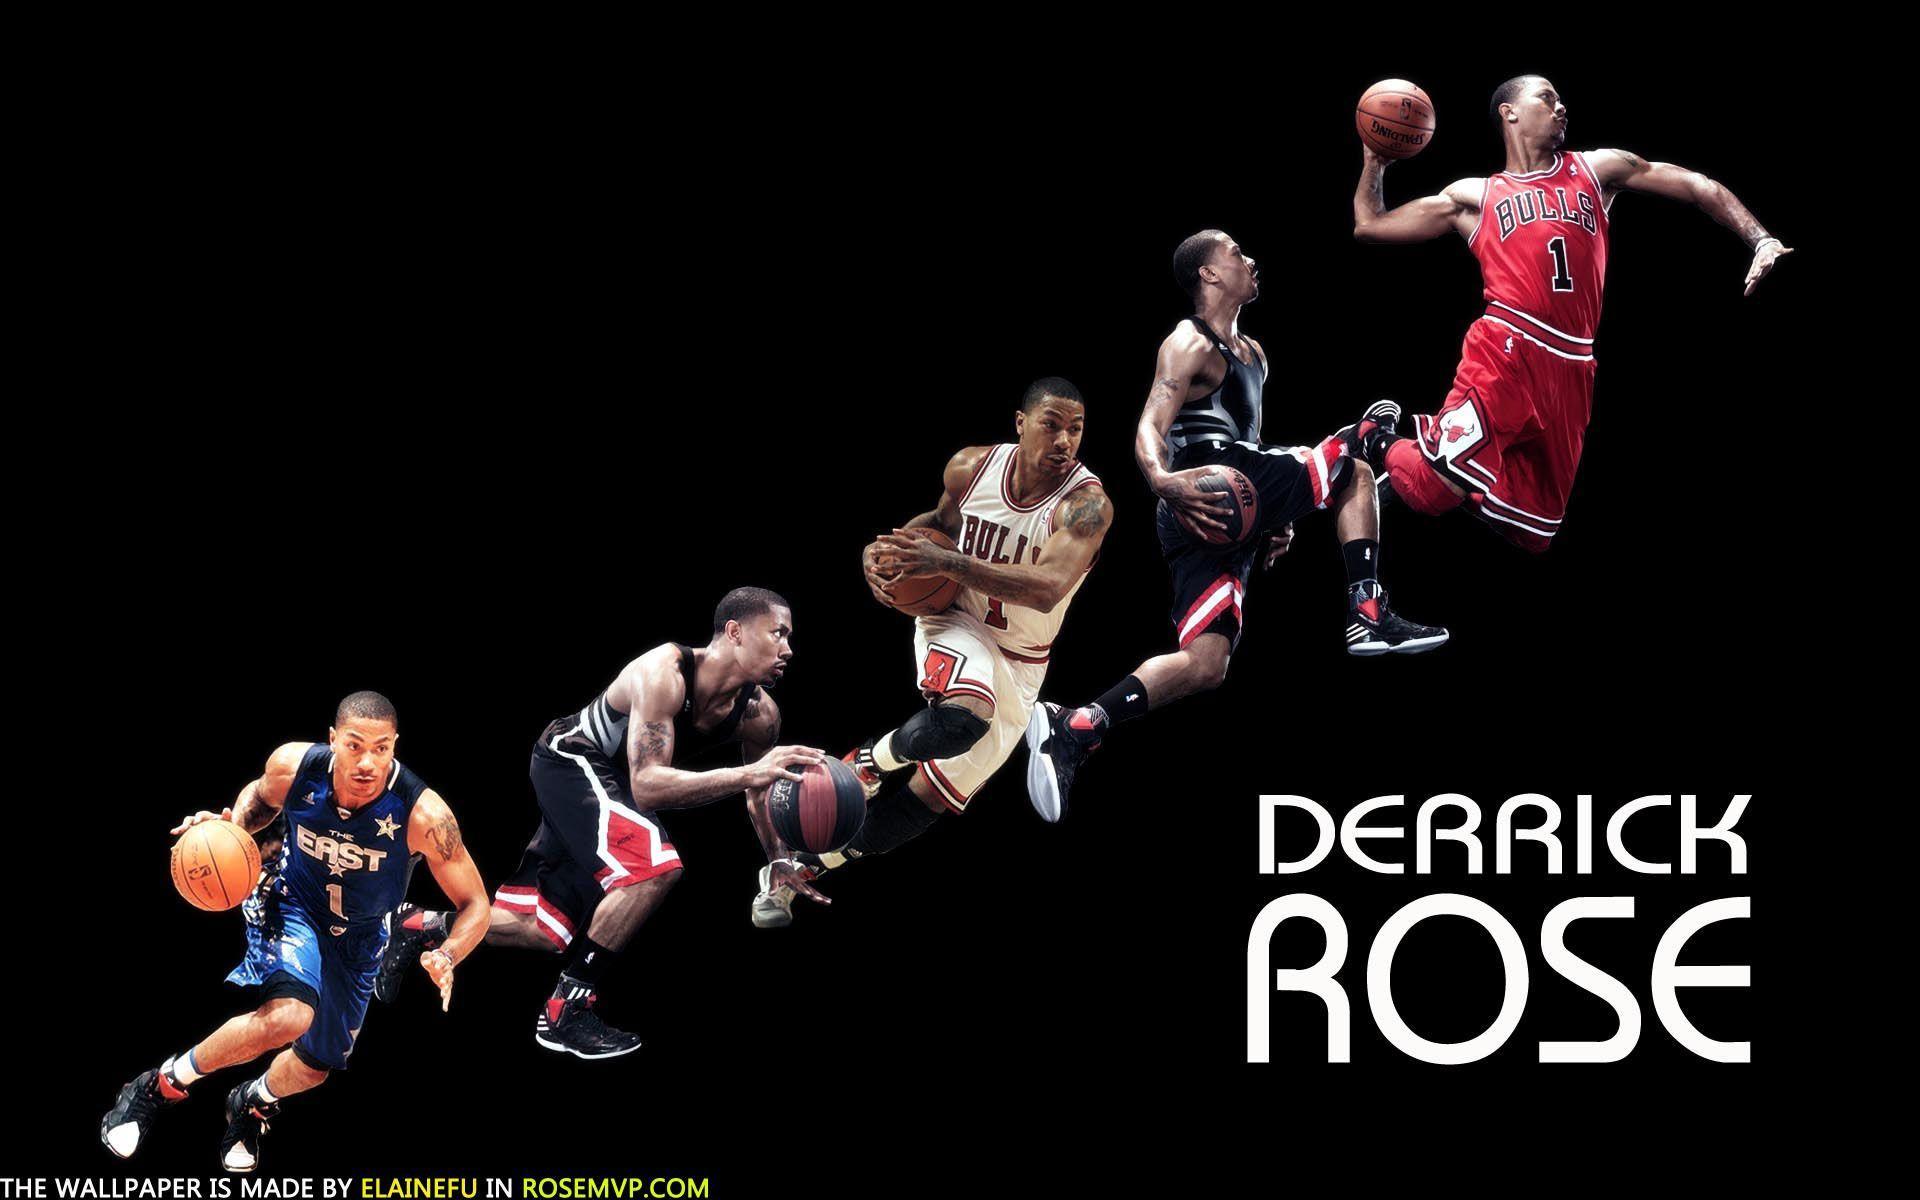 Derrick Rose Dunk HD Wallpaper Background Images